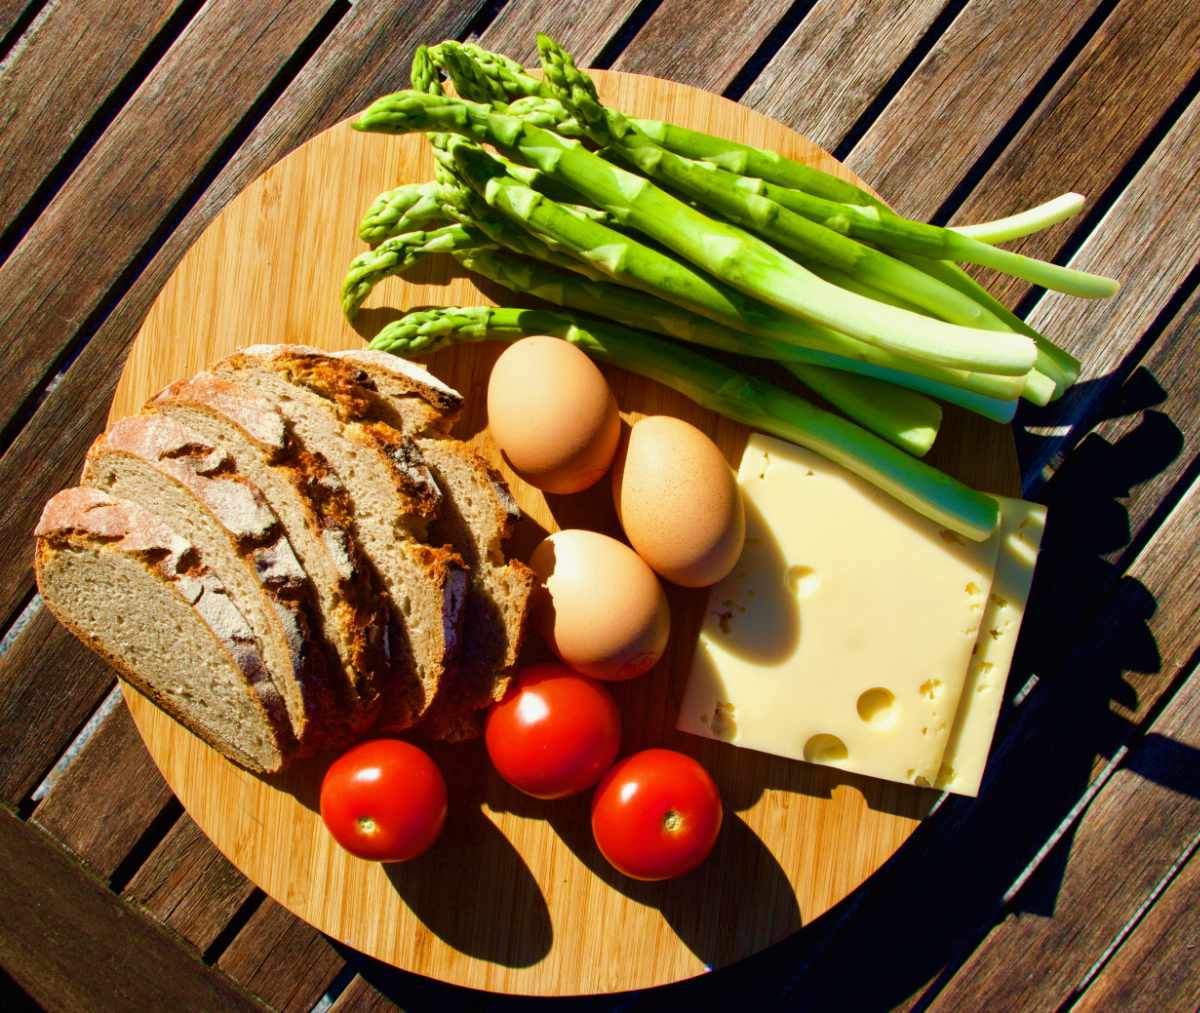 Zutaten, Rezept, schnelles Spargelgericht, grüner Spargel, Brot, Eier, Tomaten, Käse, gute Laune